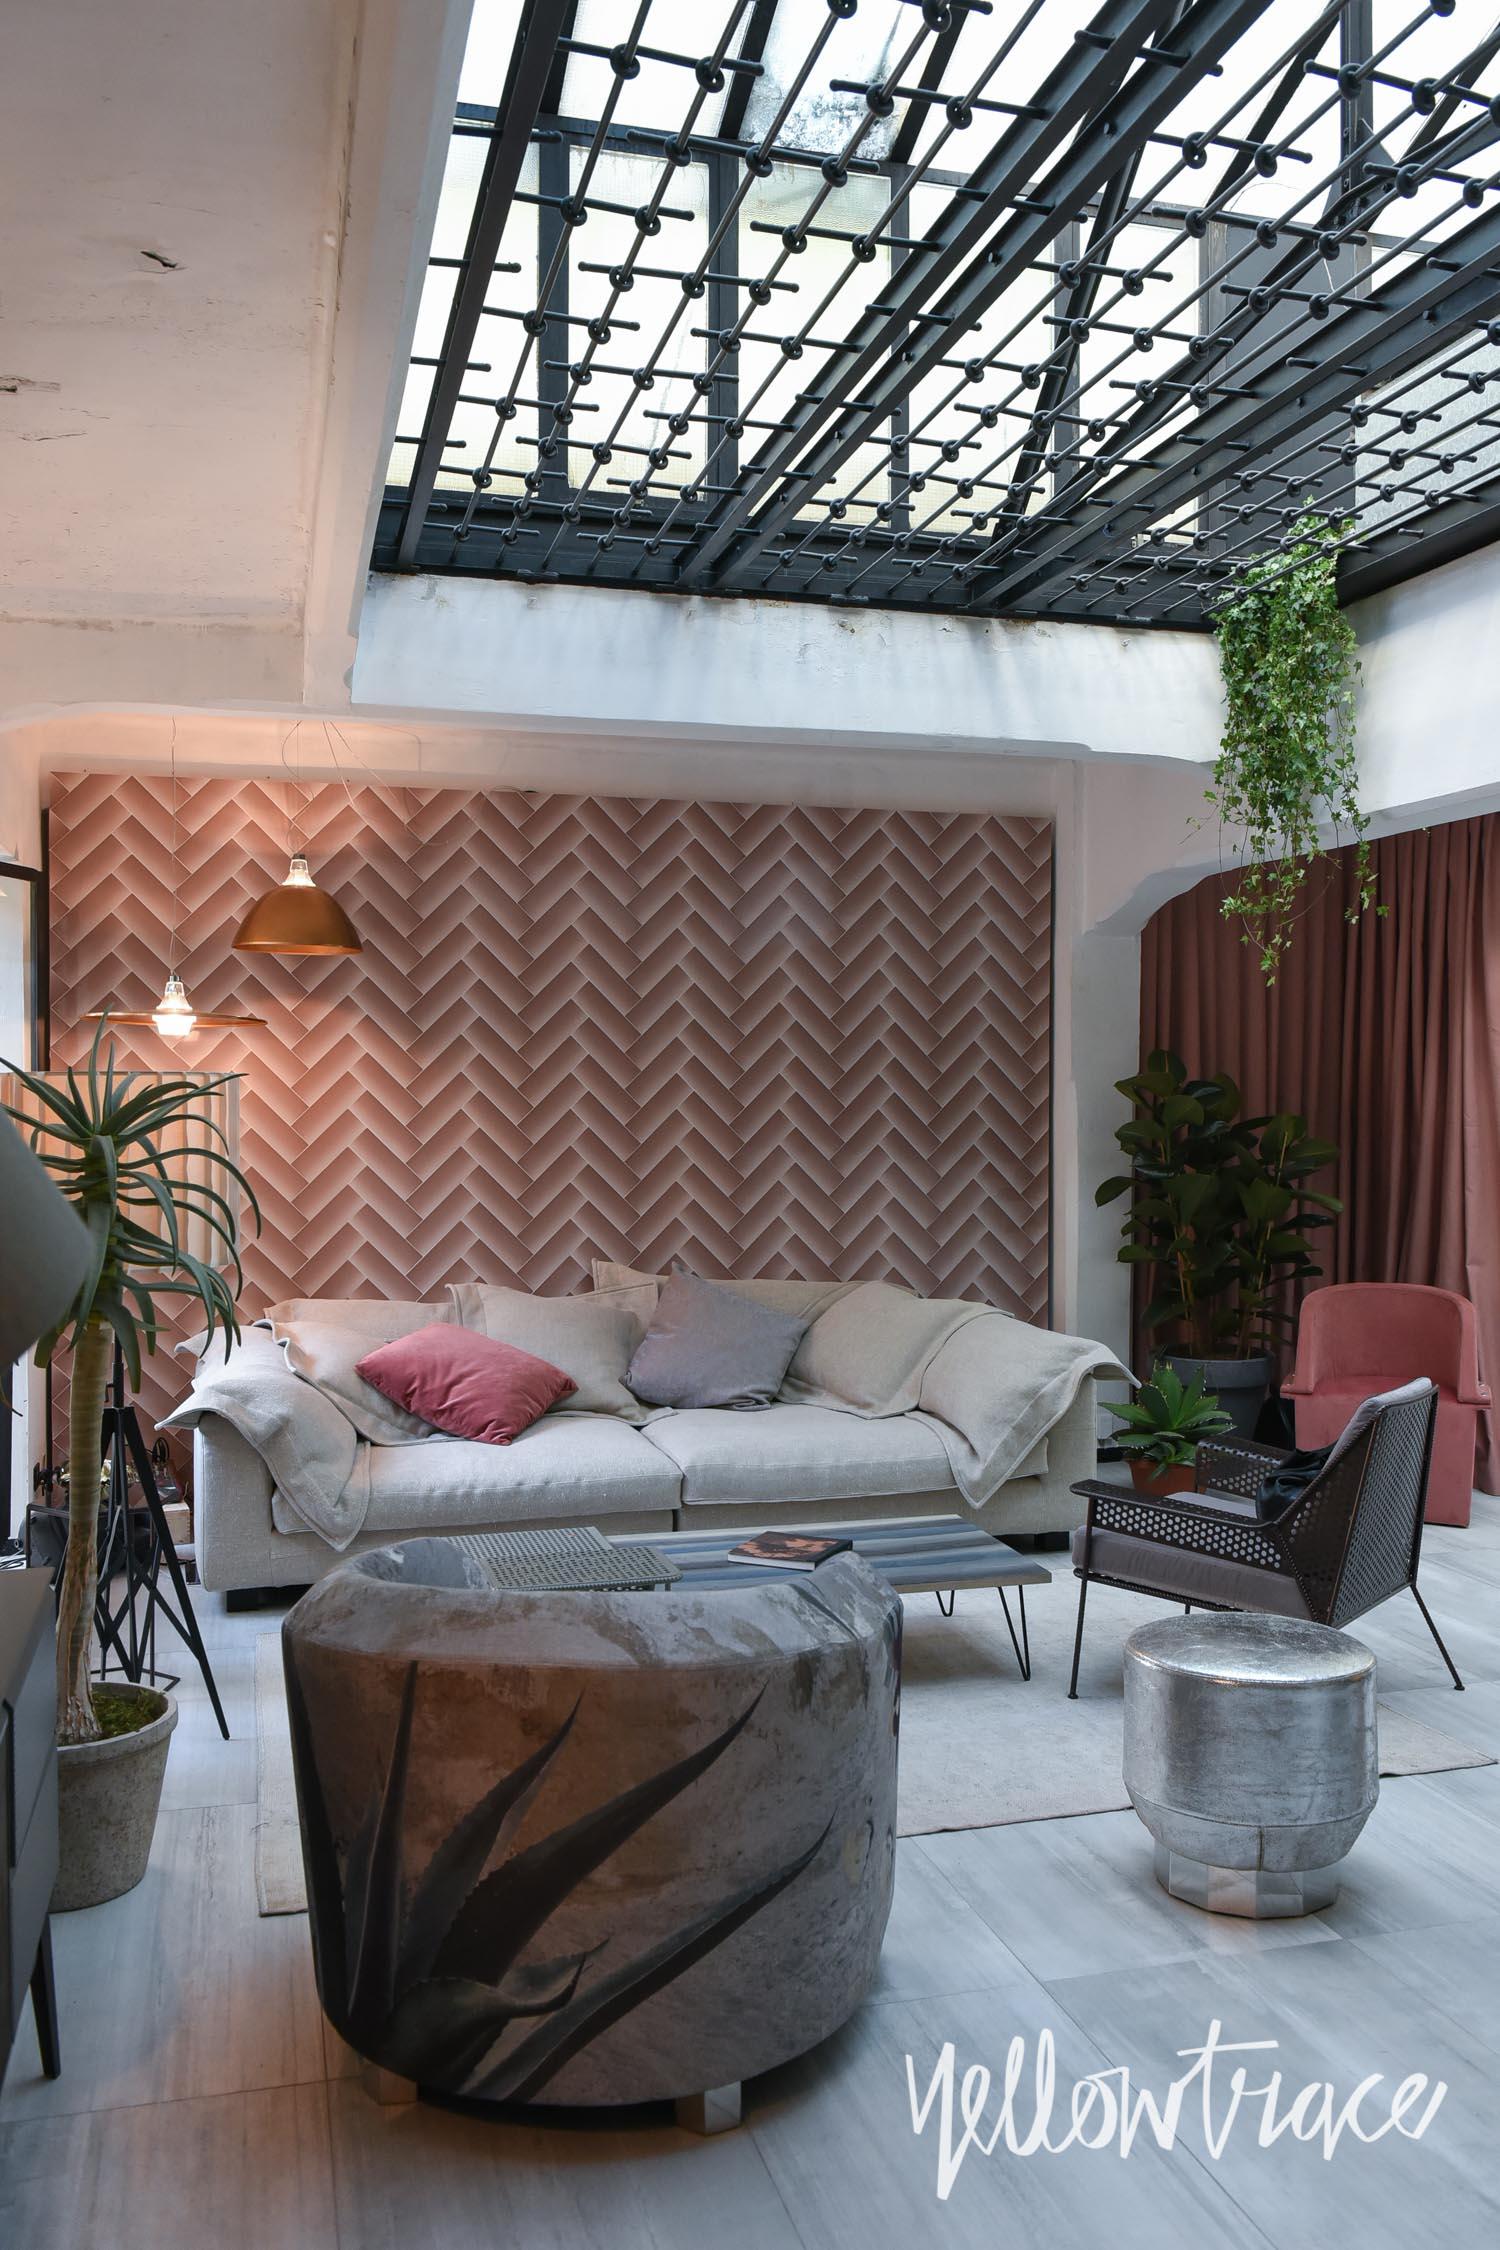 Milan Design Week 2017 Highlights, Diesel Living at 5Vie, Photo © Nick Hughes | #Milantrace2017